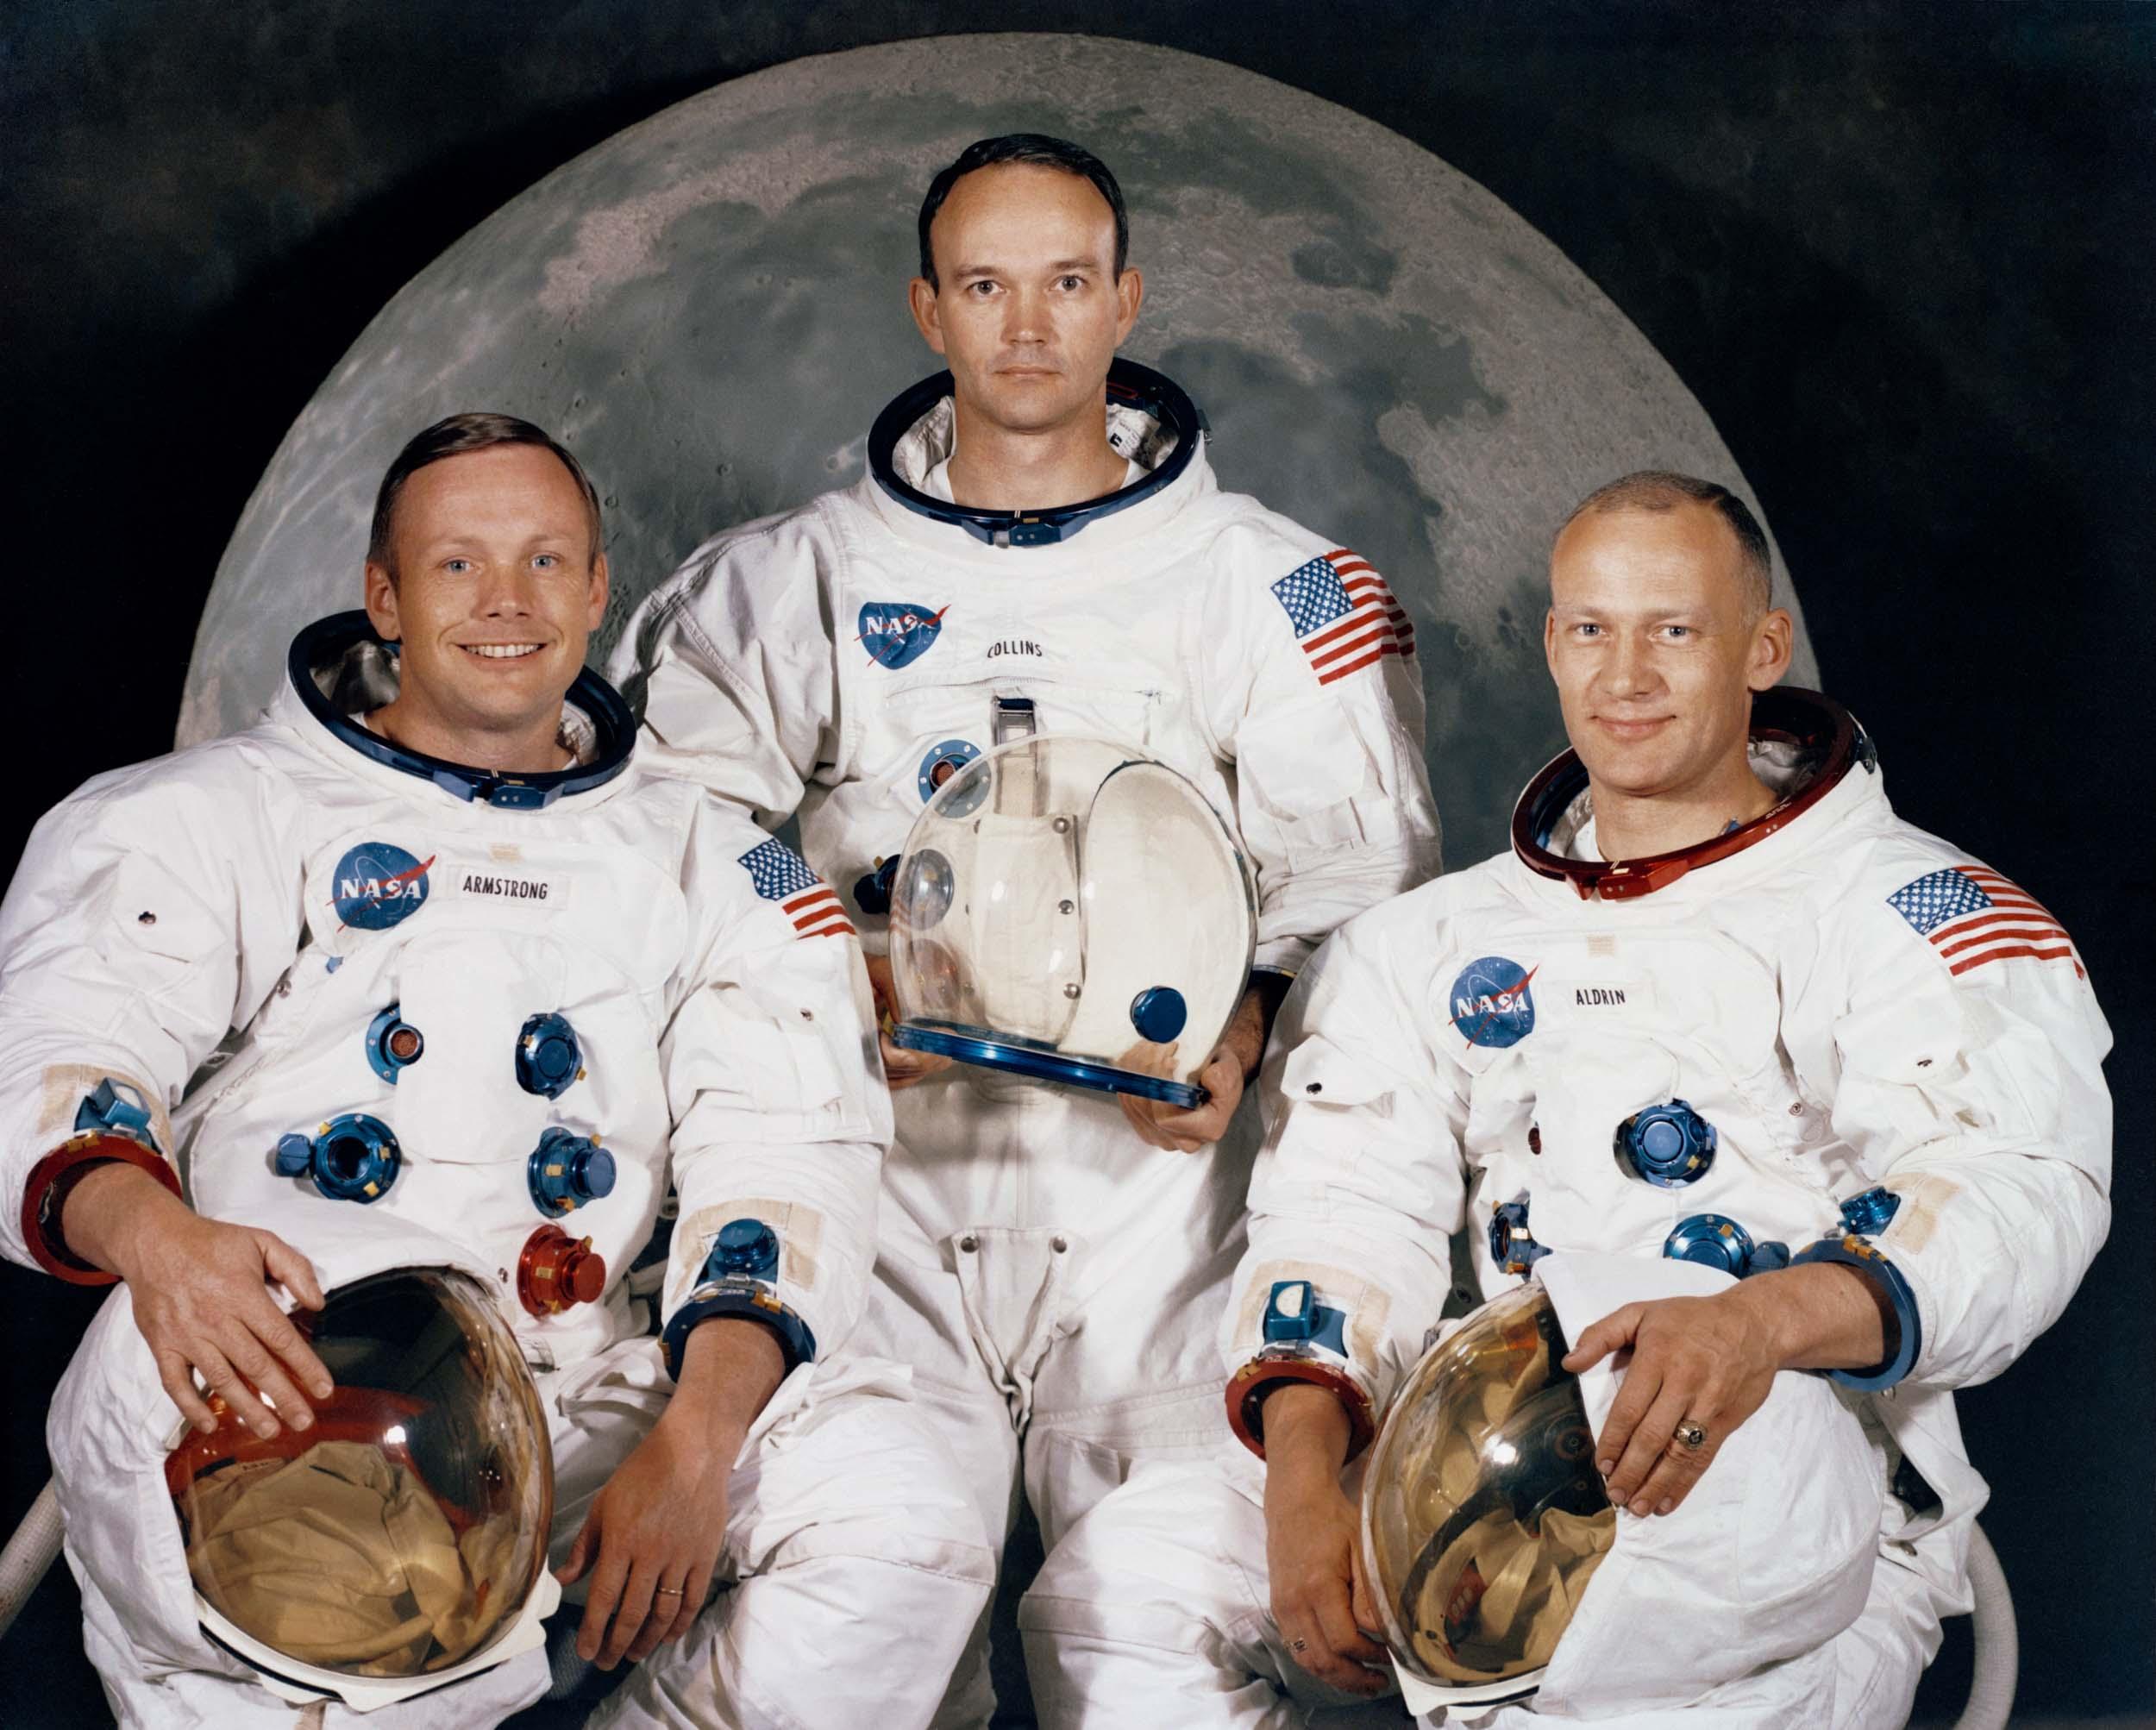 The Apollo XI crew: Armstrong, Collins, and Aldrin